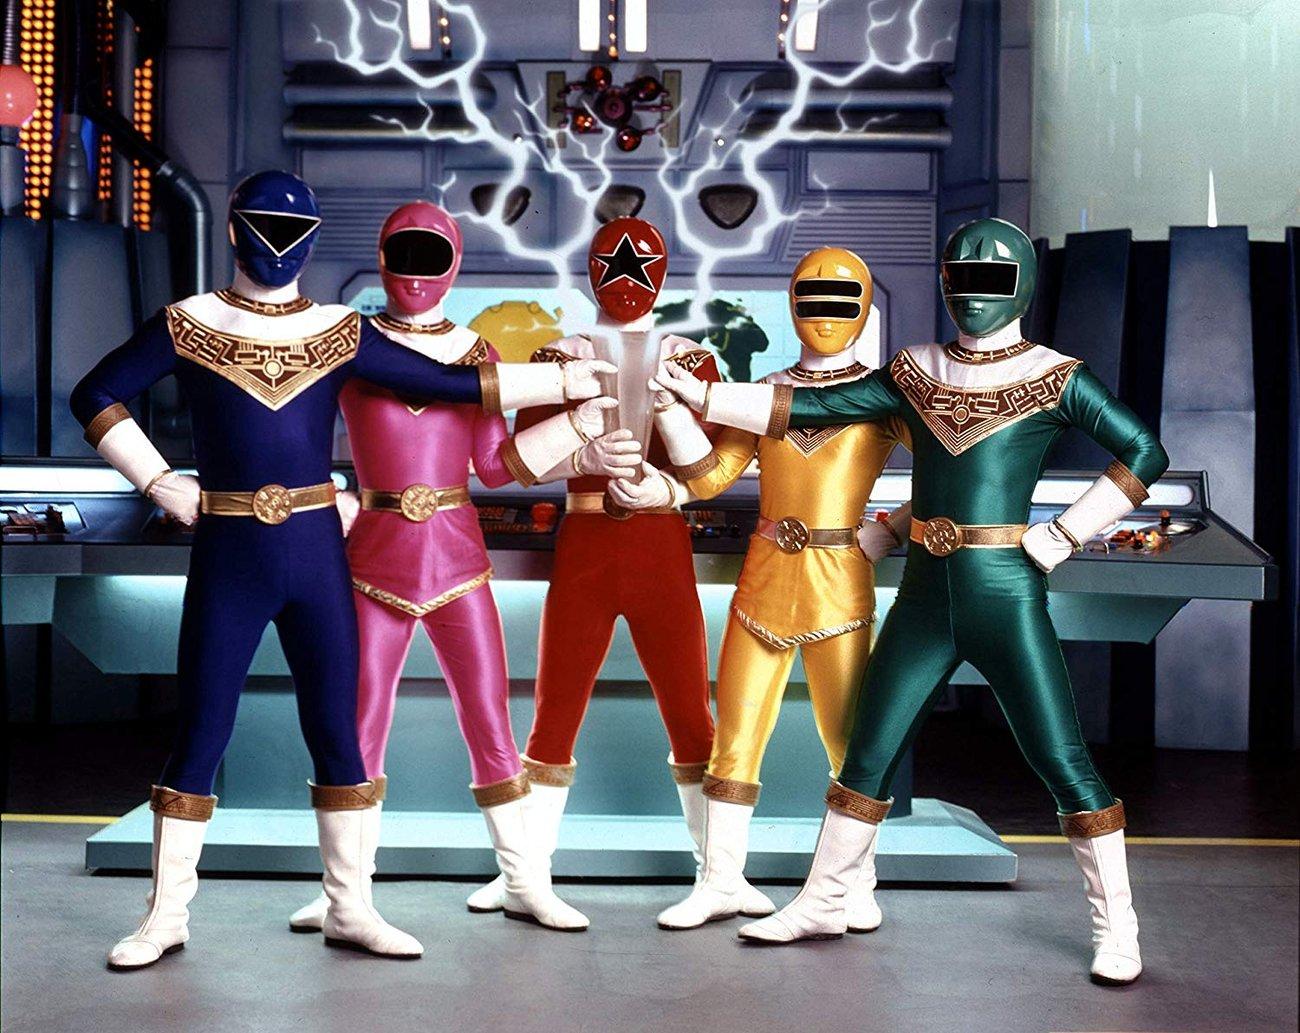 Kinderserie der 90er: Power Rangers